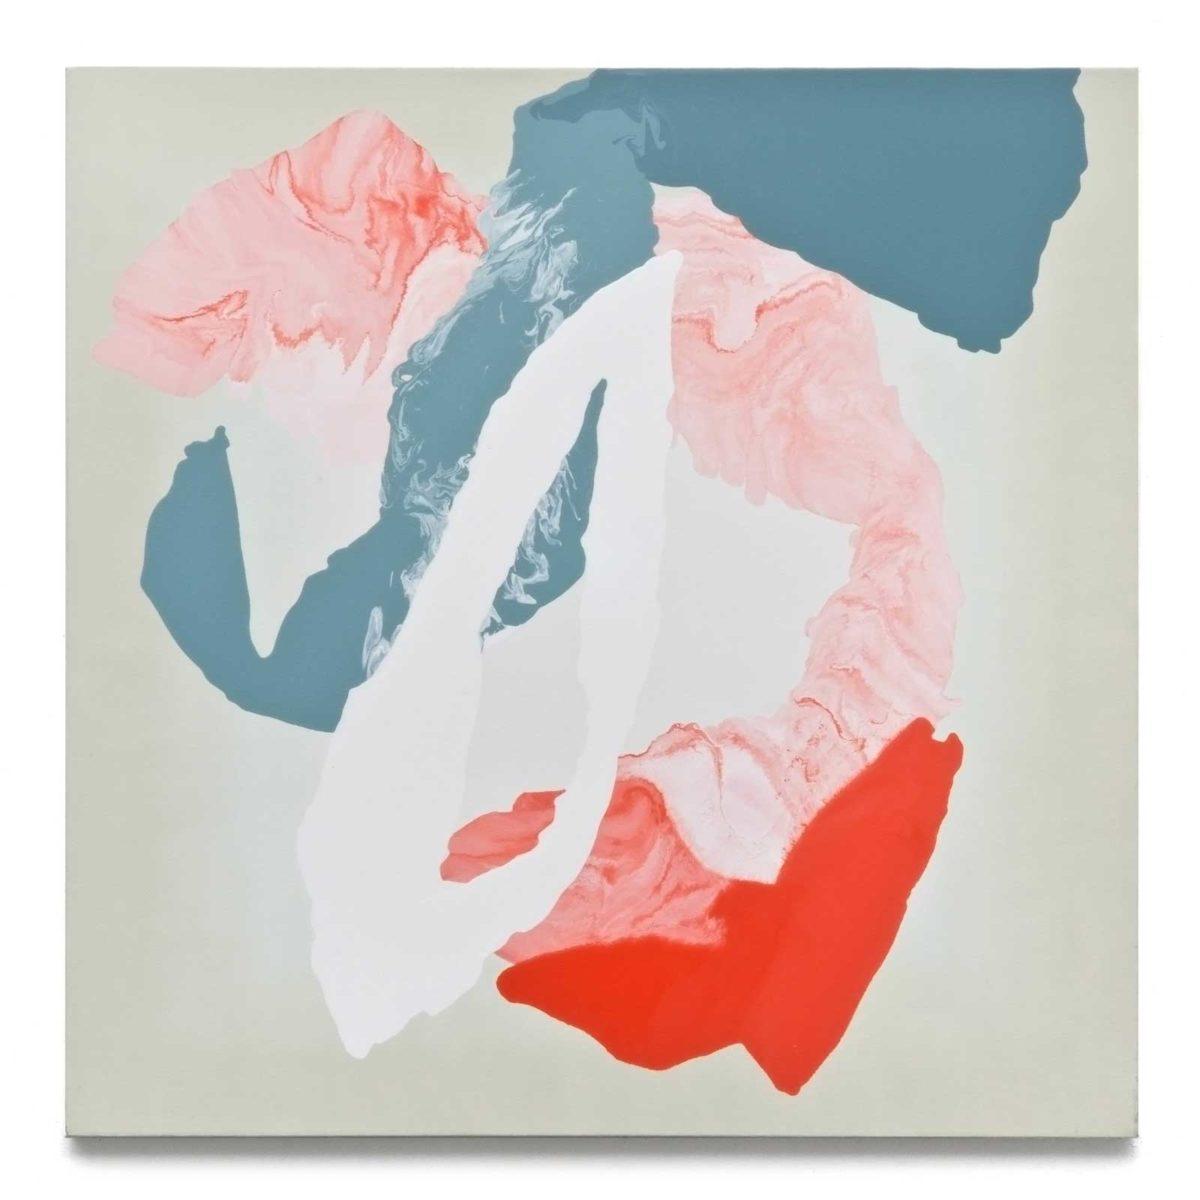 Ephemeral-matter-oil-on-canvas-96.52 cm x 96.52 cm.